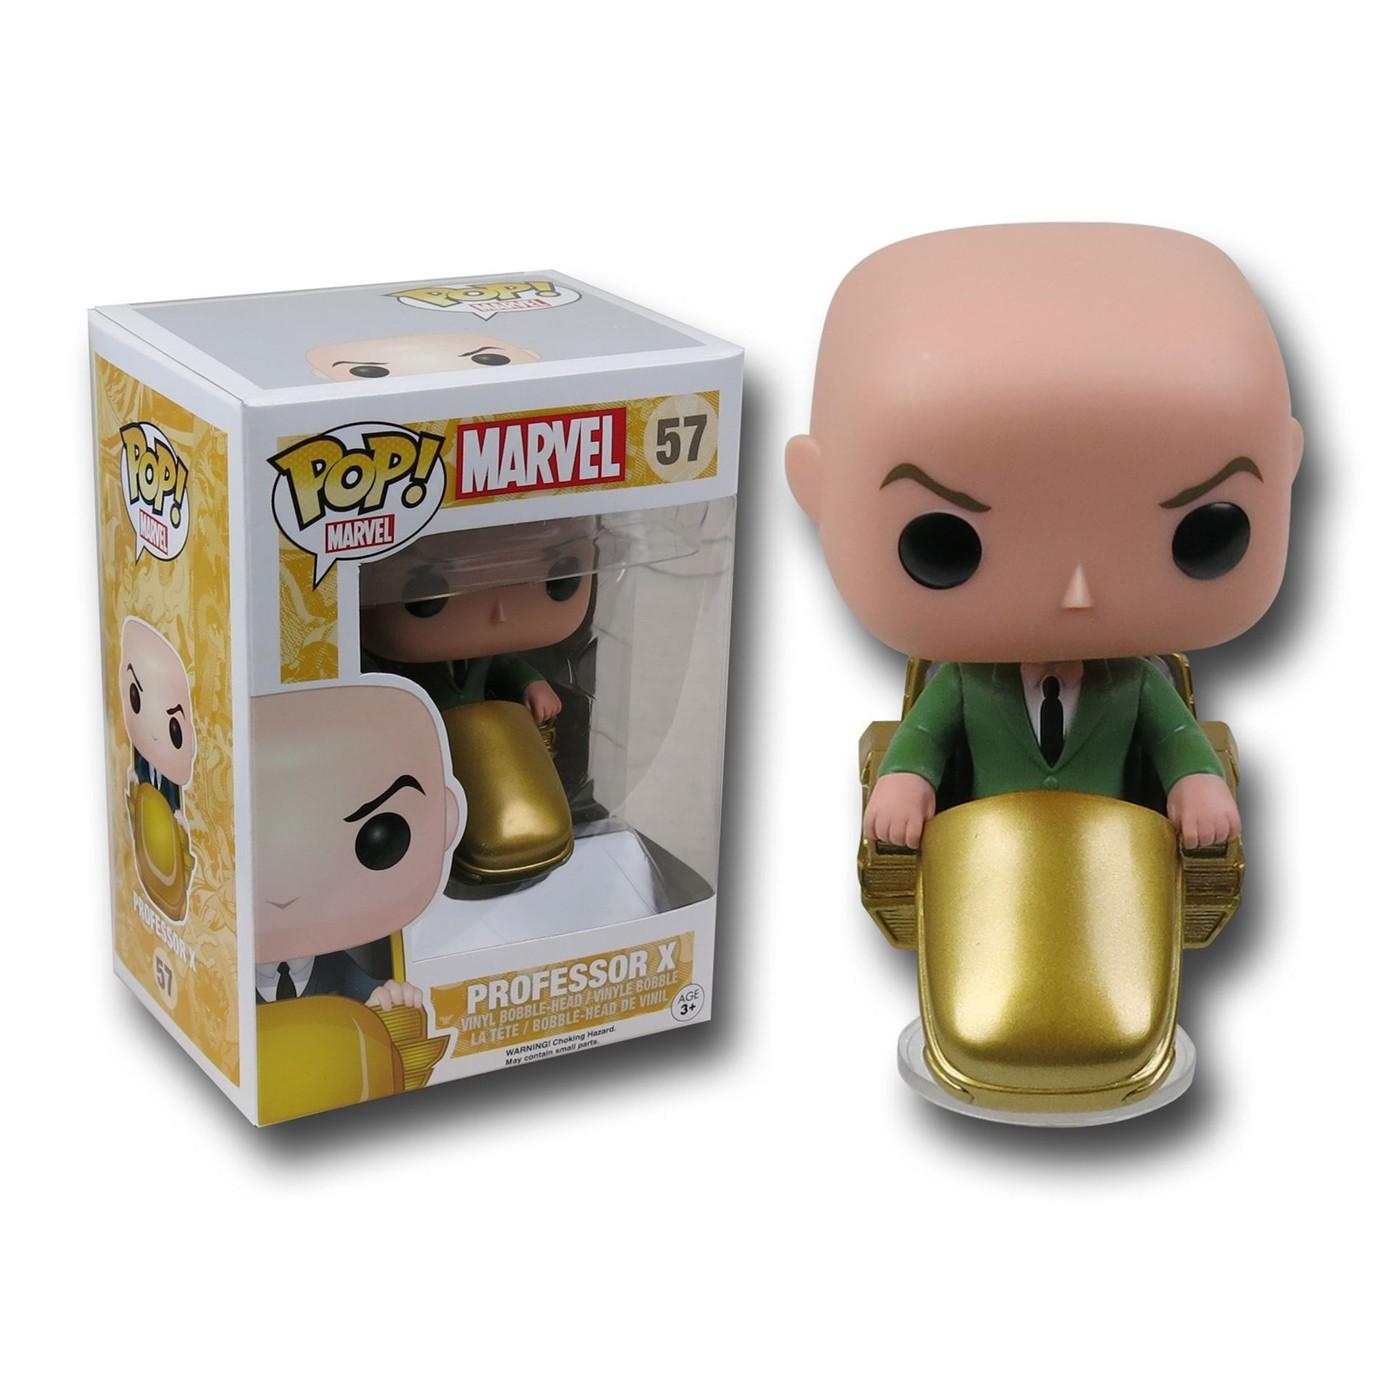 X-Men Professor X Pop Vinyl Bobble Head